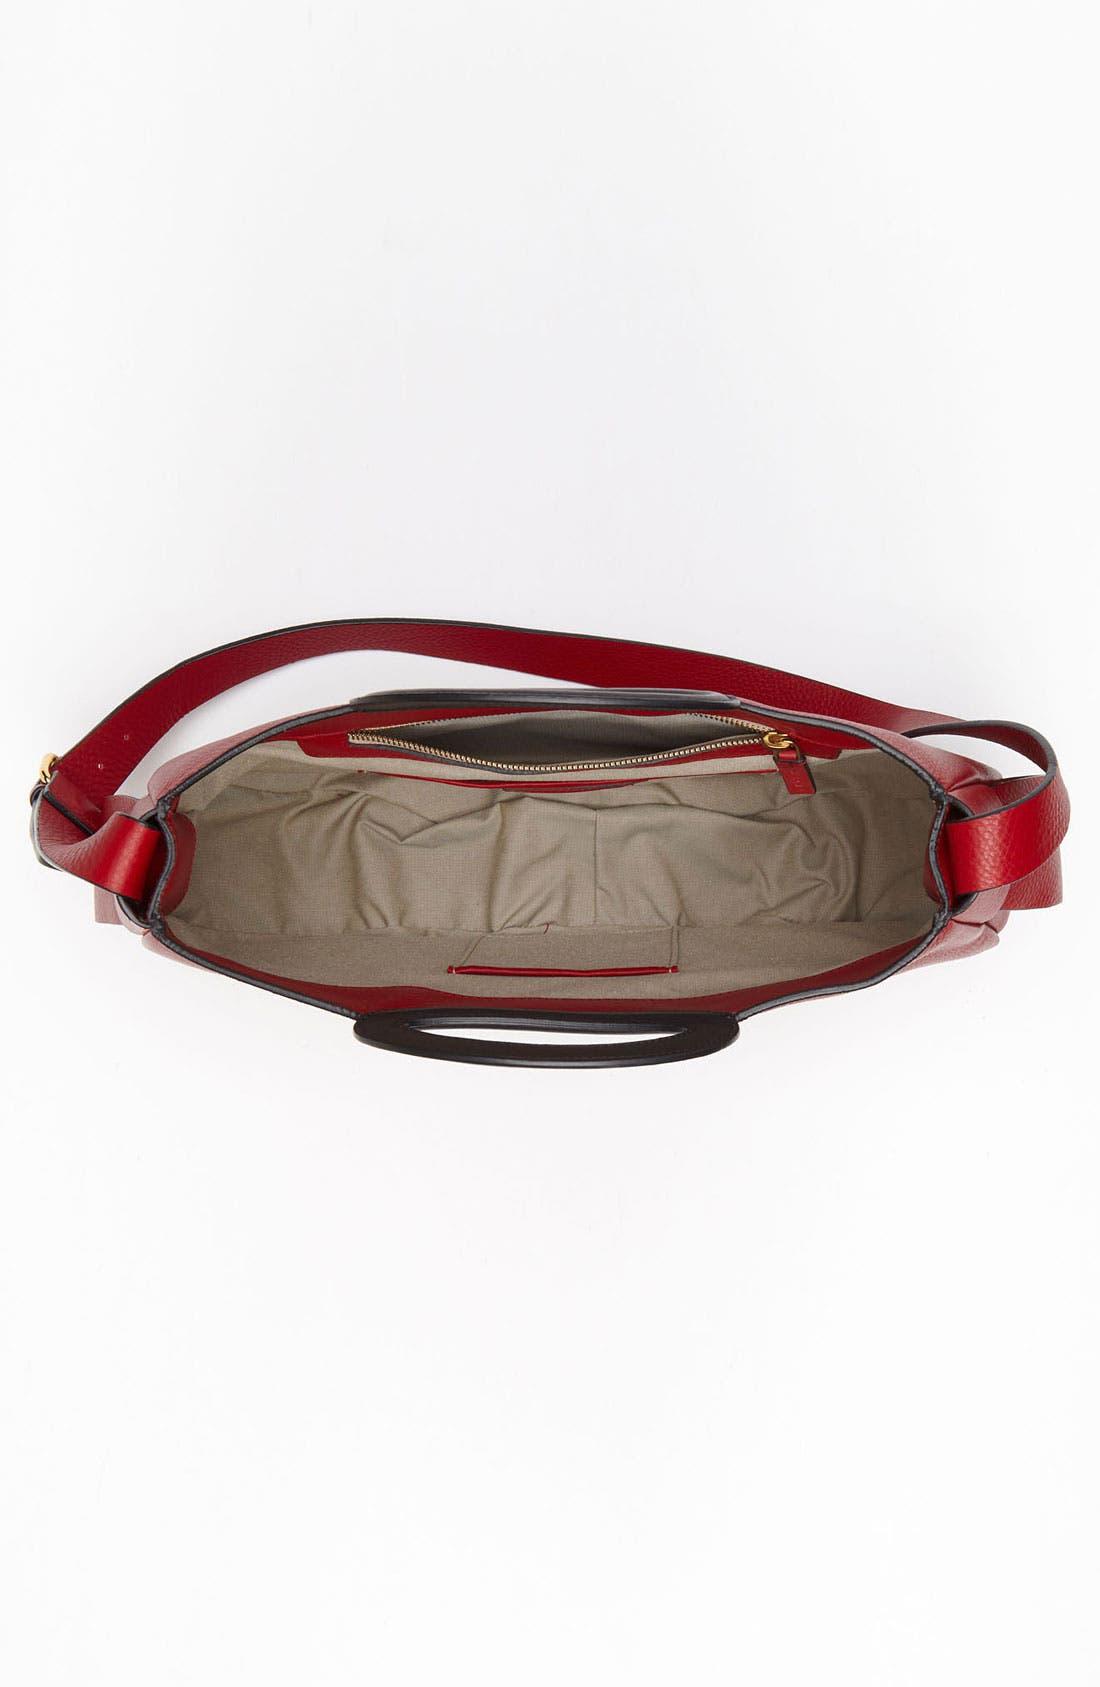 Alternate Image 3  - Marni 'Balloon - Medium' Leather Crossbody Bag